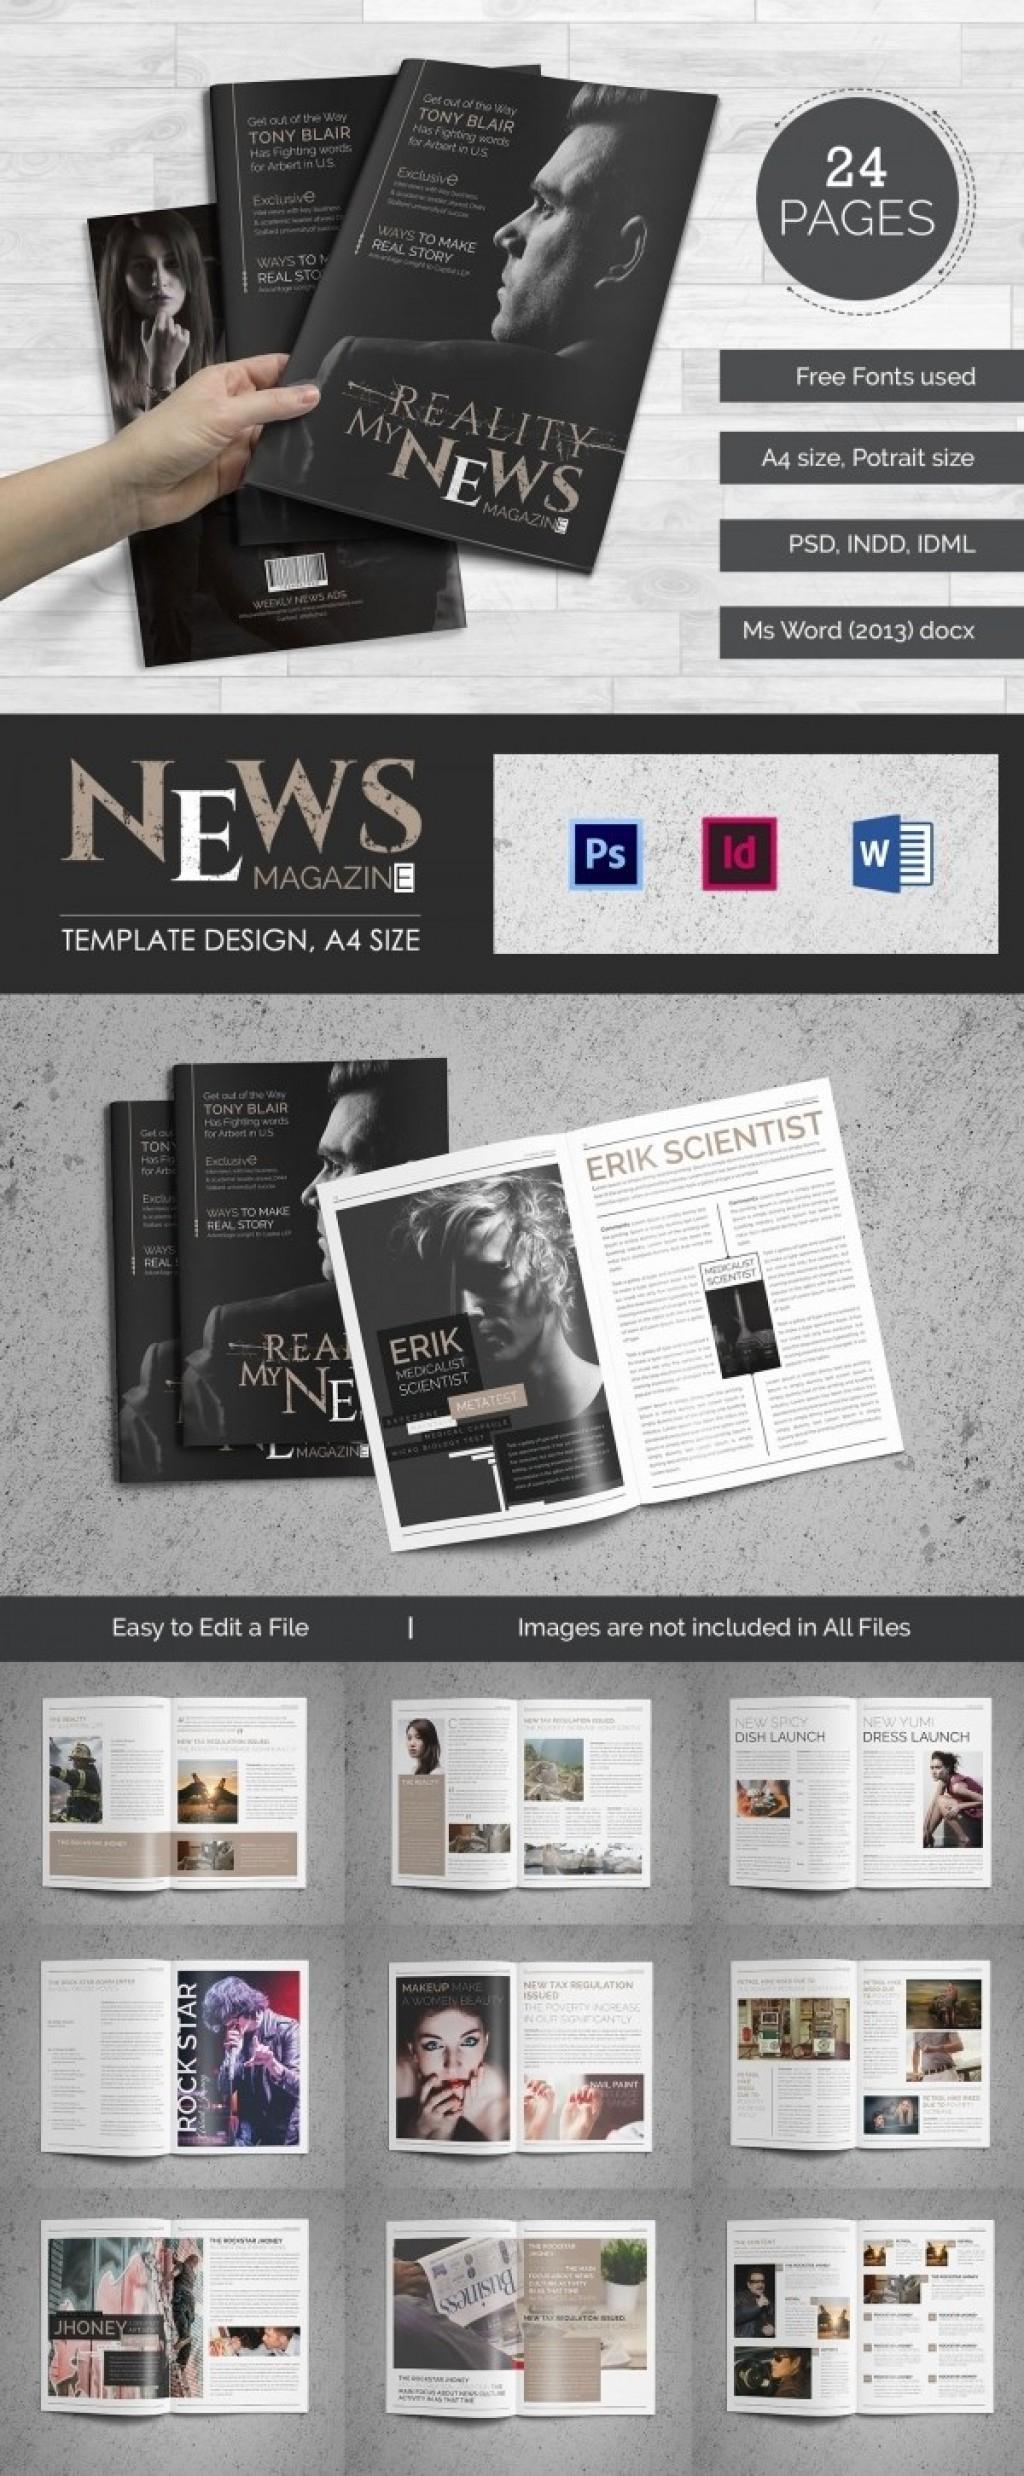 028 Magazine Template For Microsoft Word Wondrous Ideas Free With Regard To Magazine Template For Microsoft Word